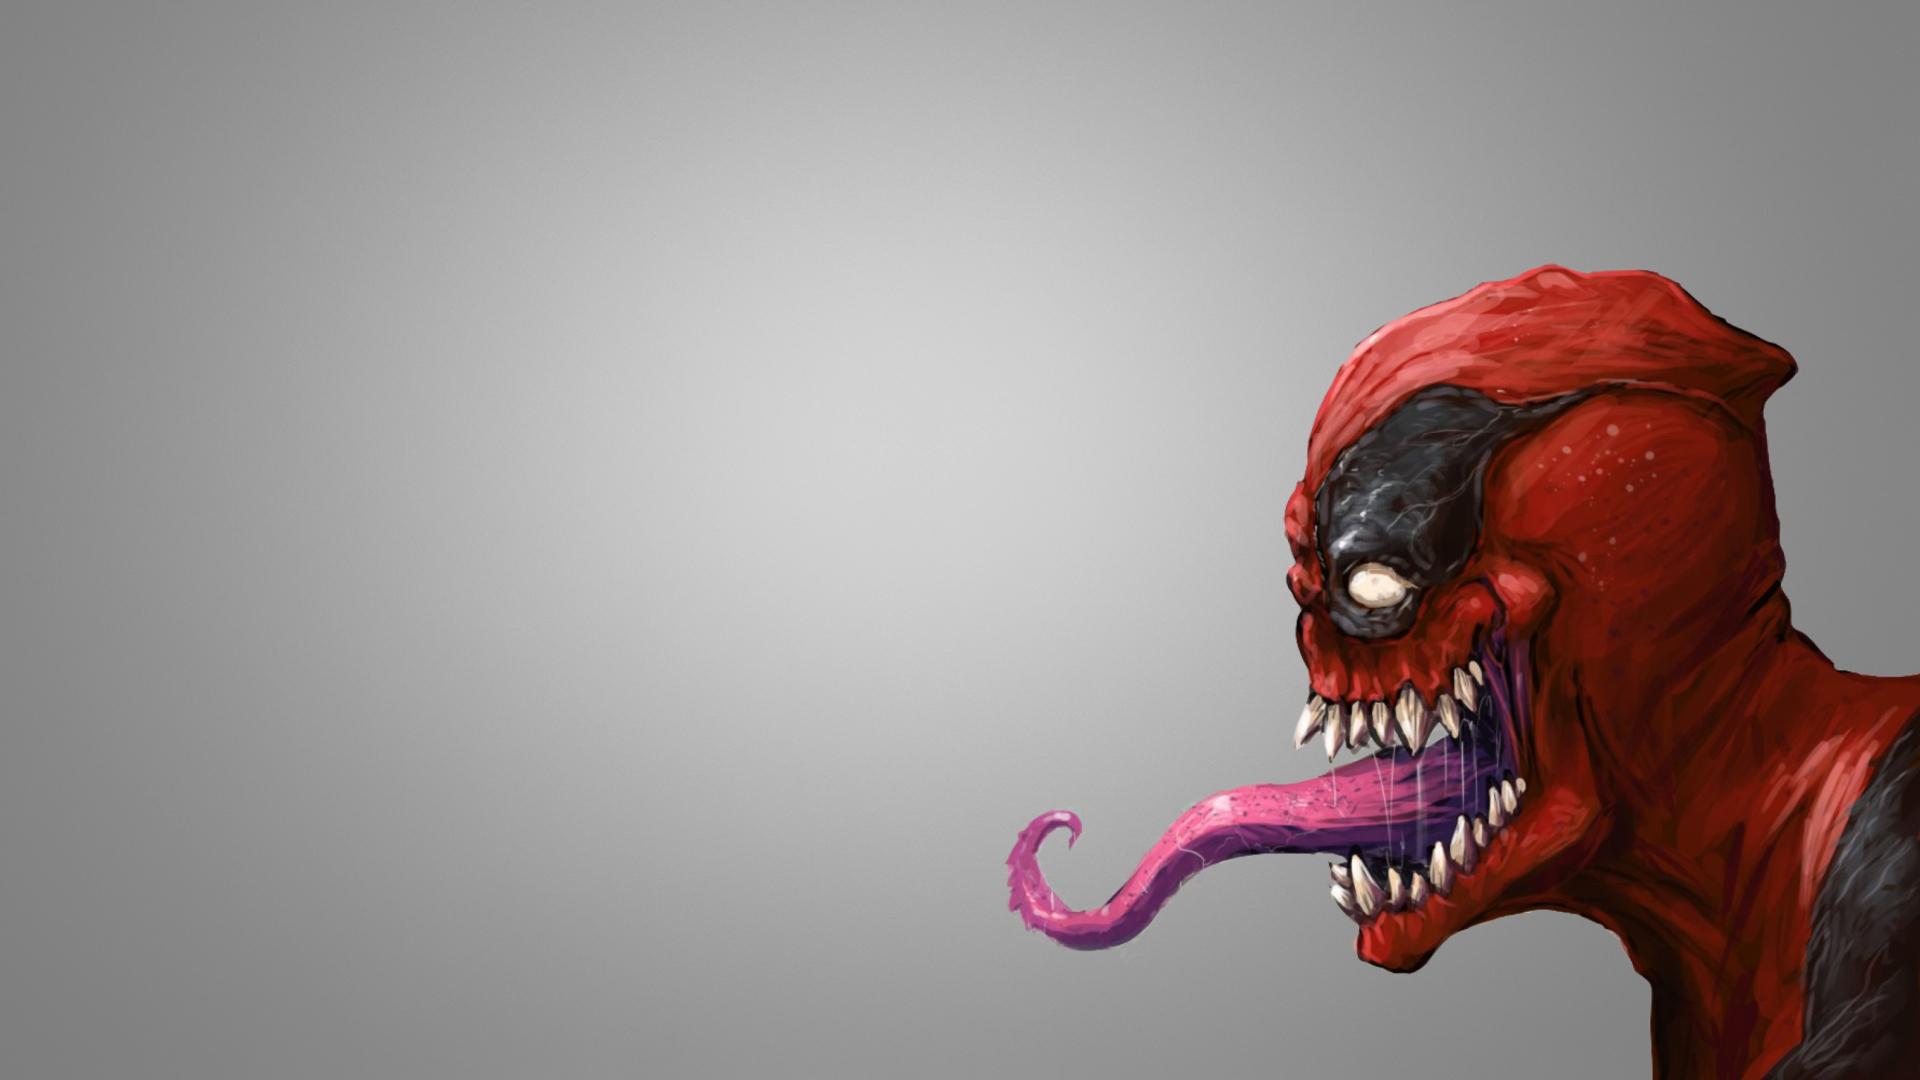 Fondos De Pantalla De Deadpool: Imagenes Para Fondo De Pantalla Hd Deadpool Ancha Hd Fondo